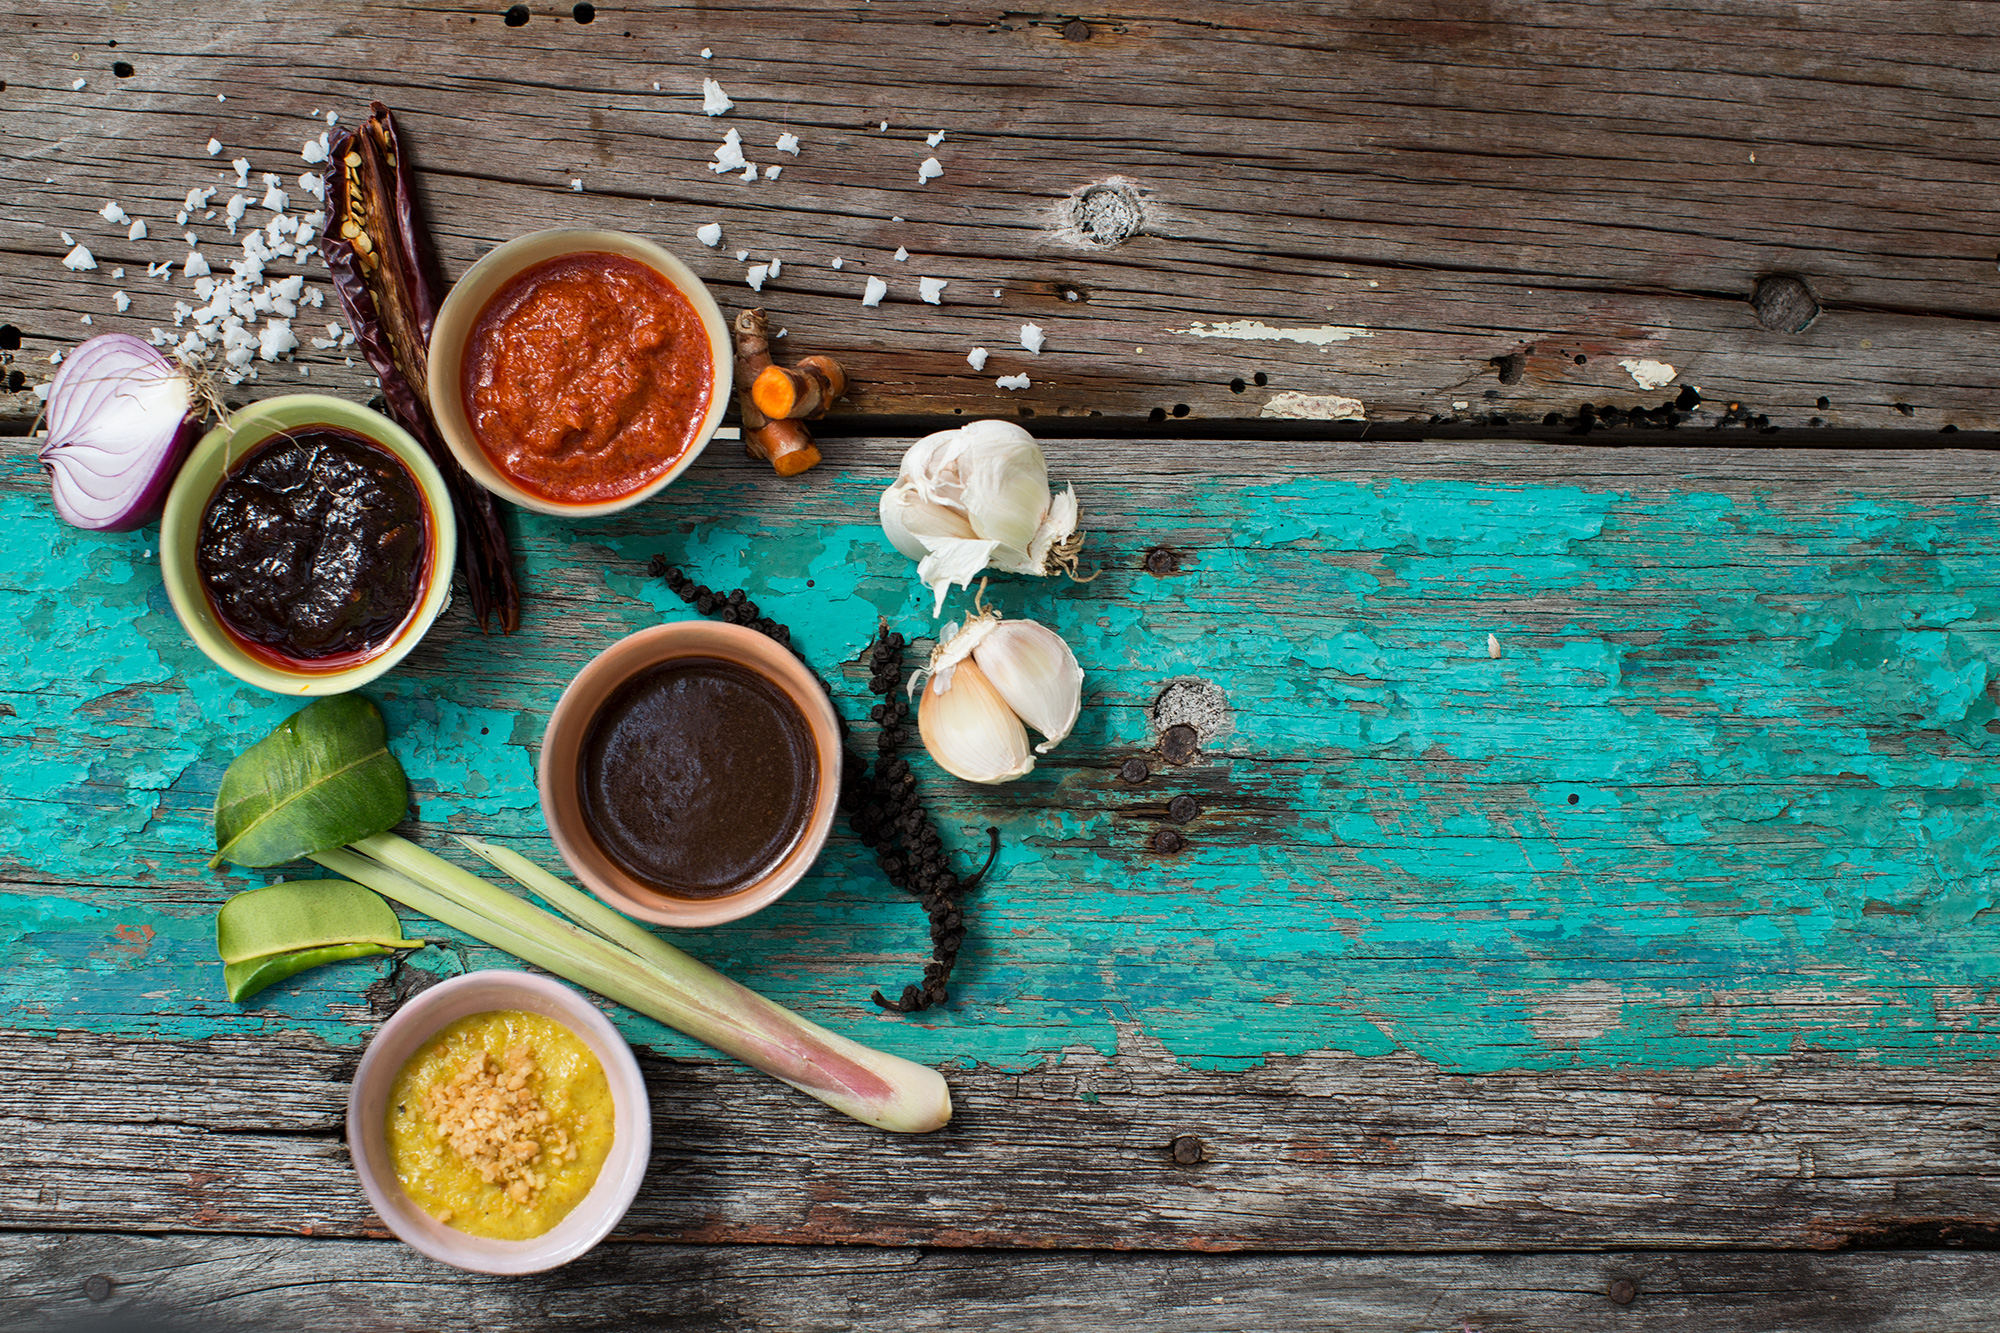 The Khmer Cuisine – Zutaten